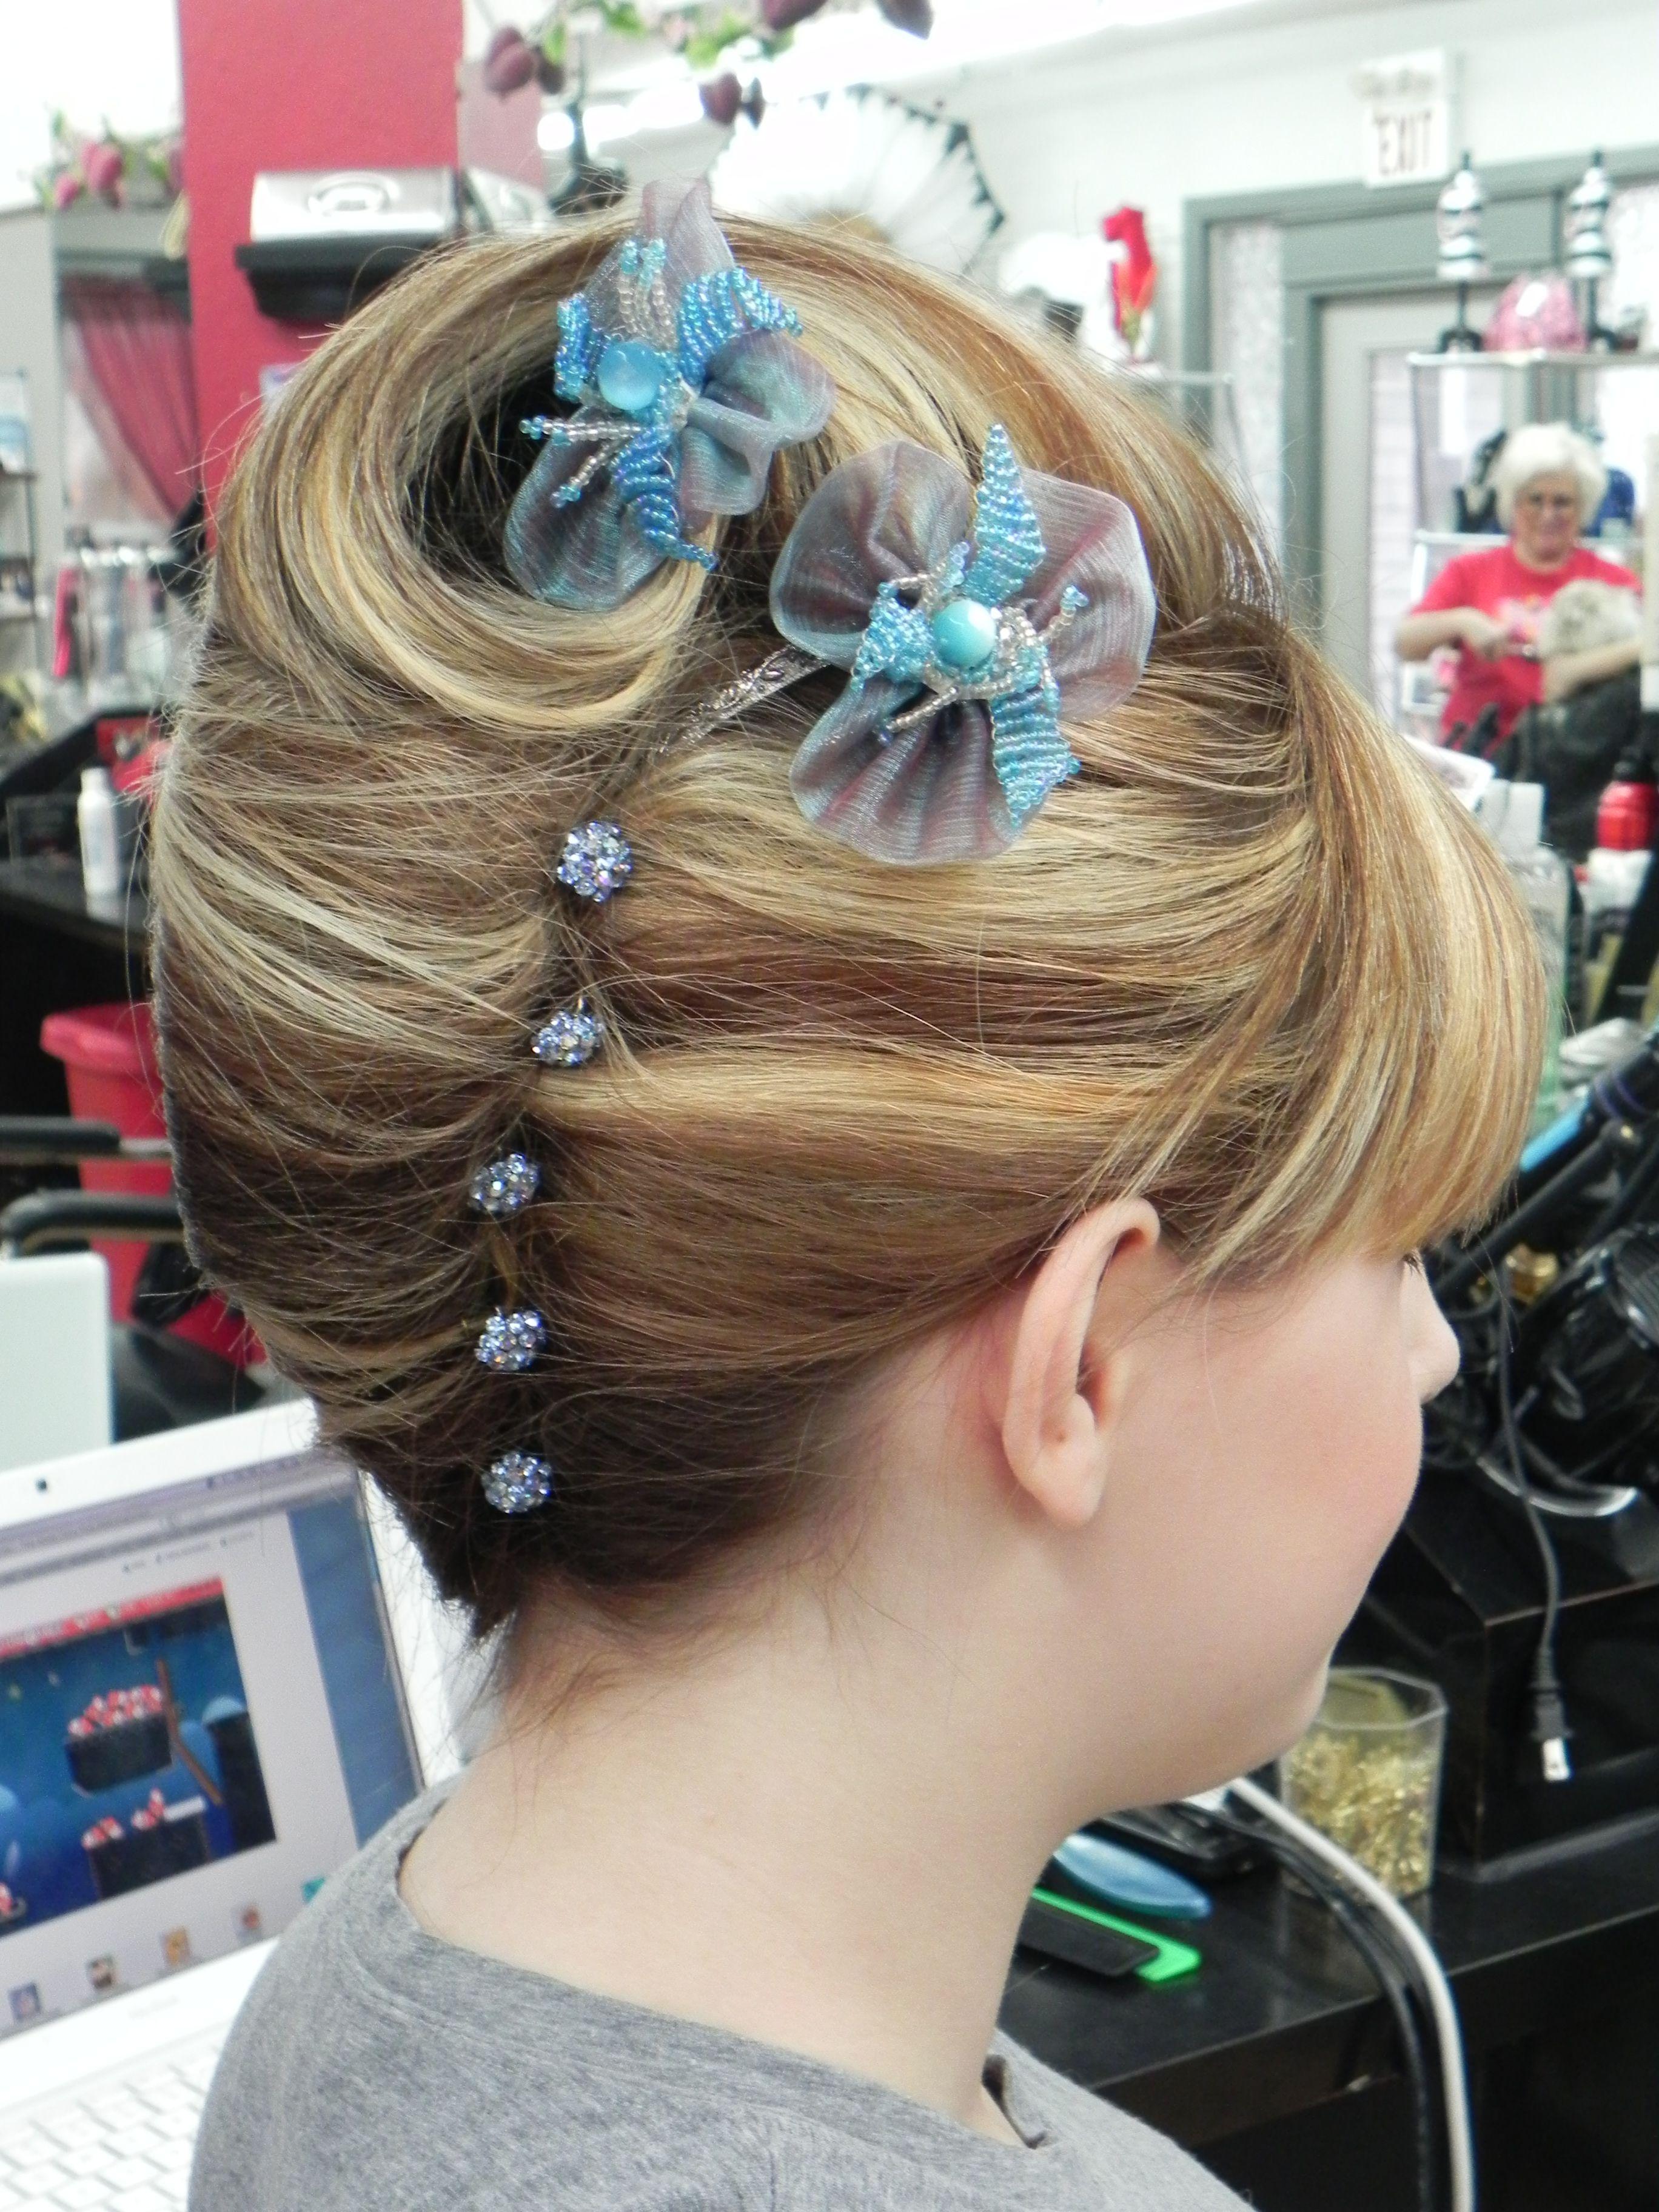 Decorative french twist hairstyles wedding updo